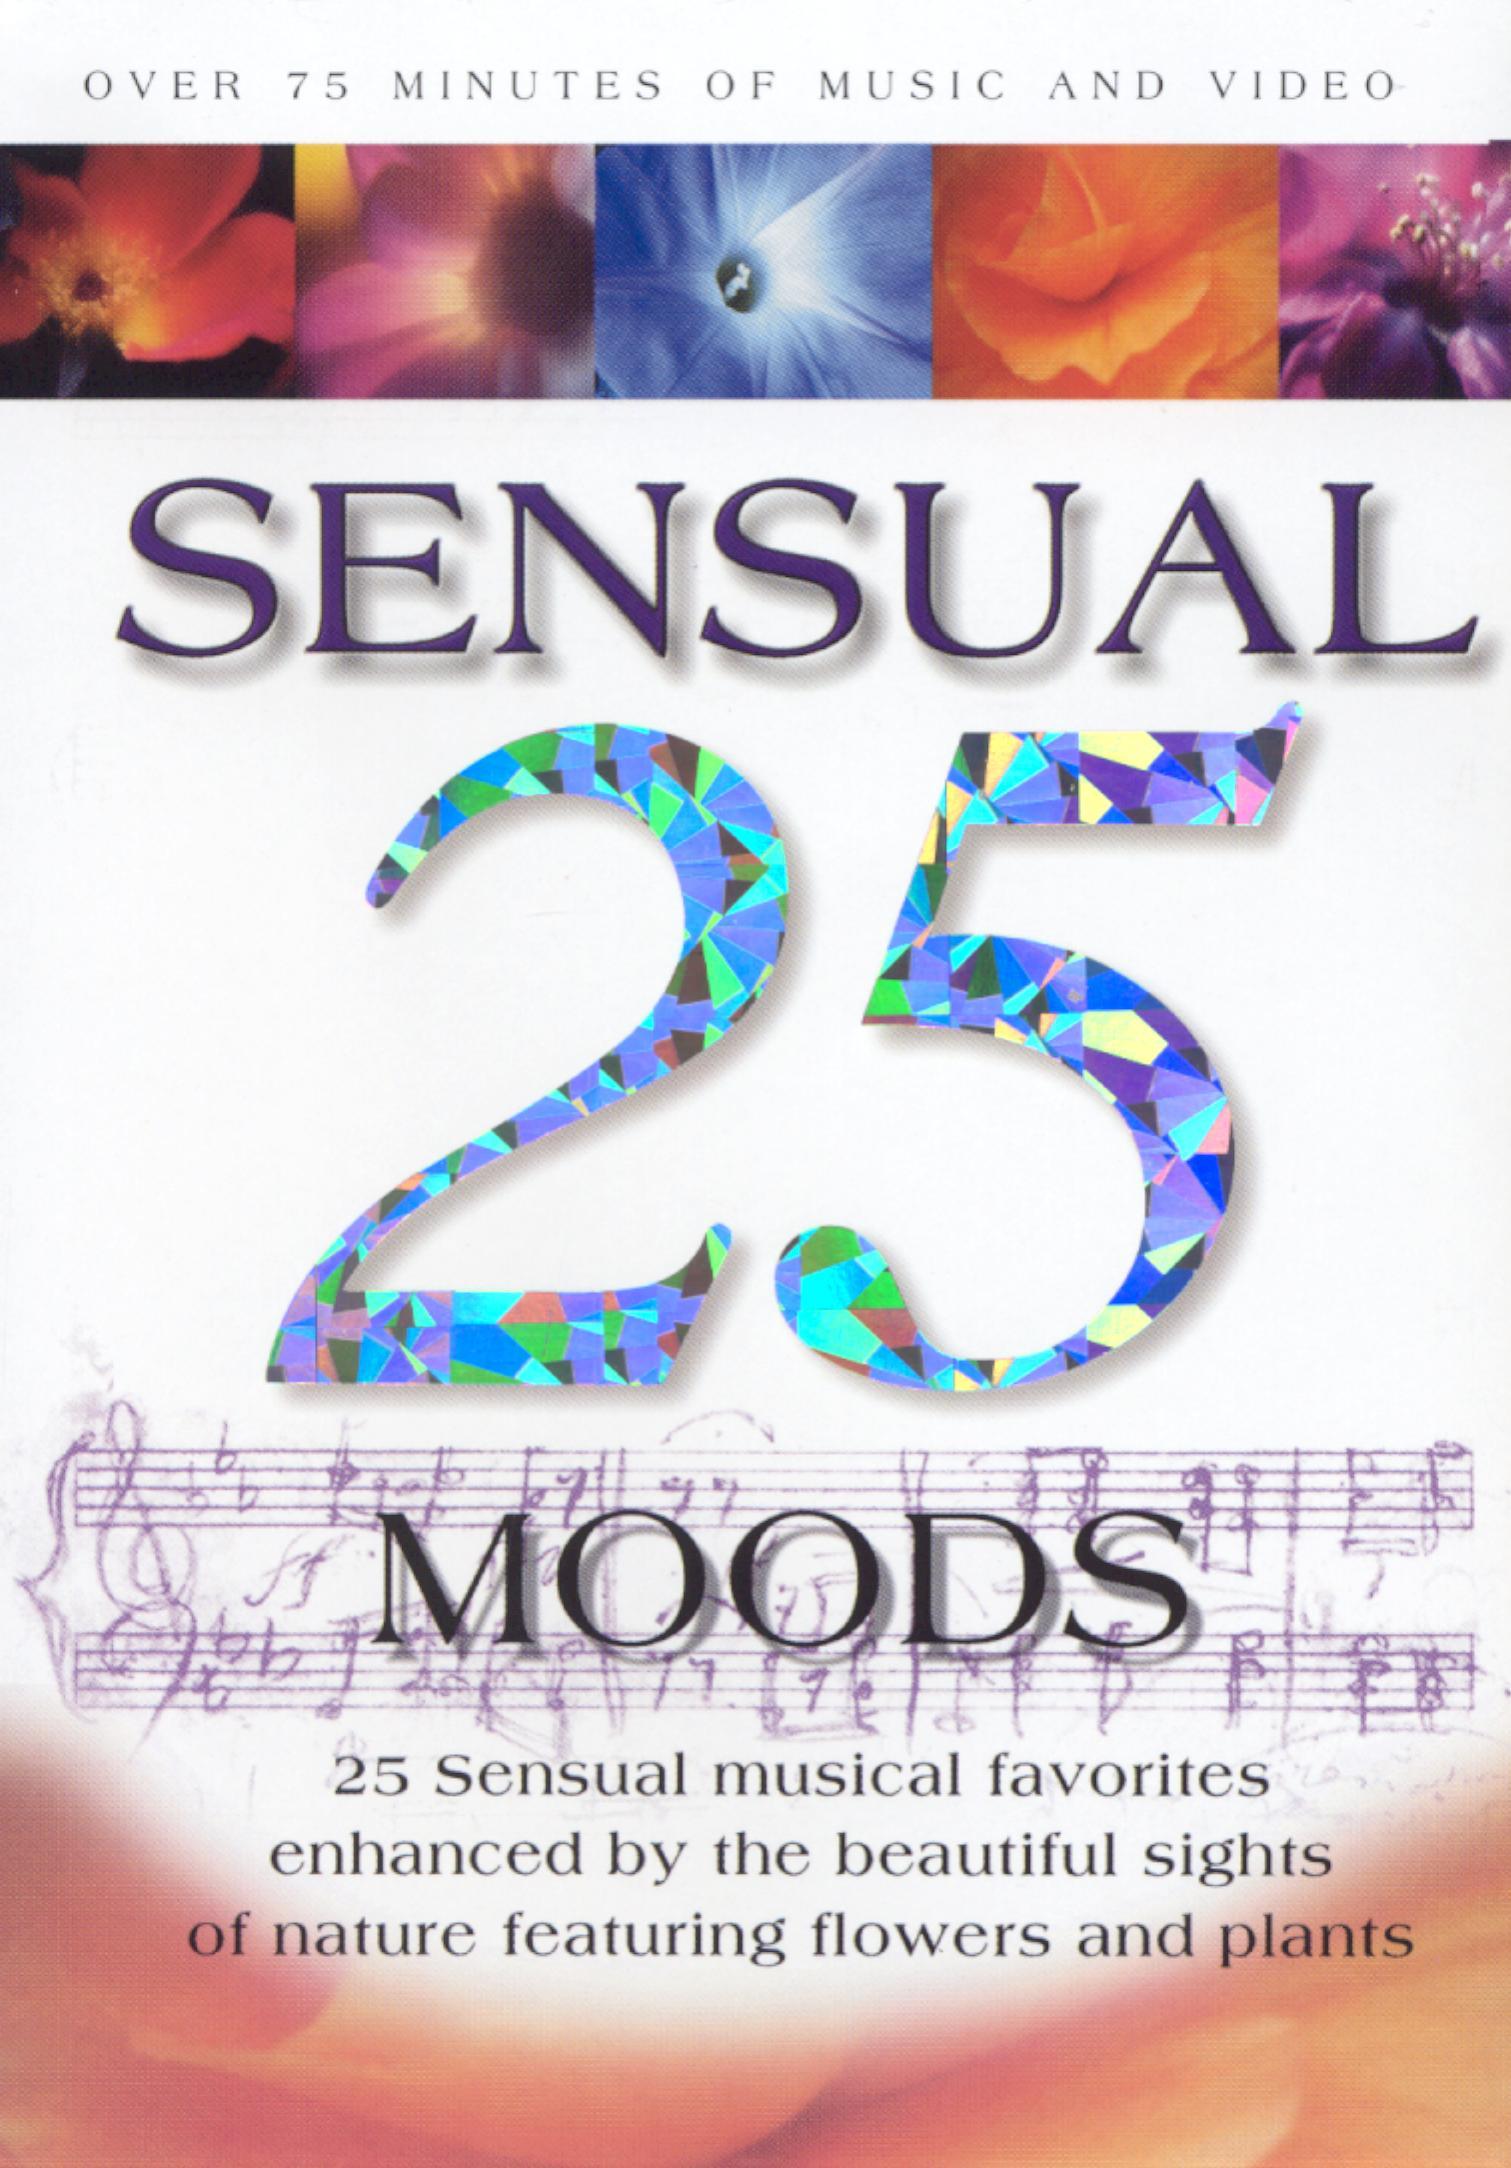 25 Sensual Moods